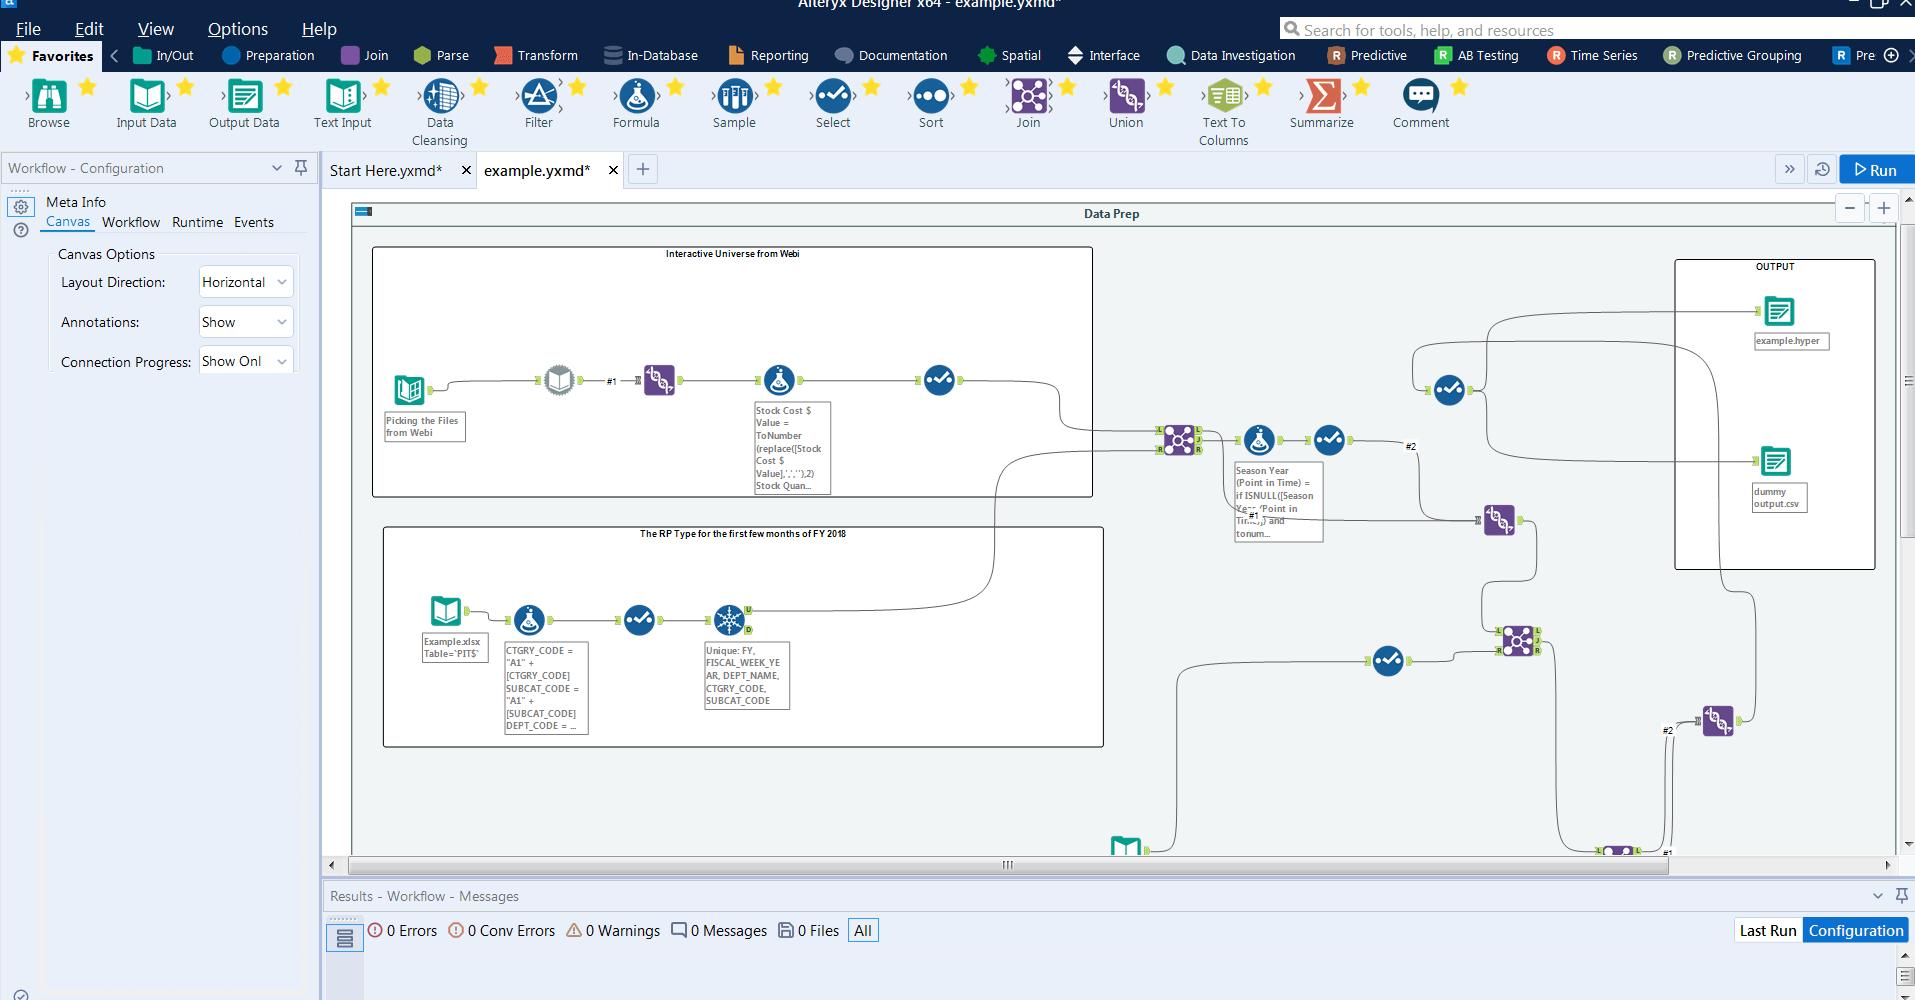 Alteryx Training Workflow Screenshot